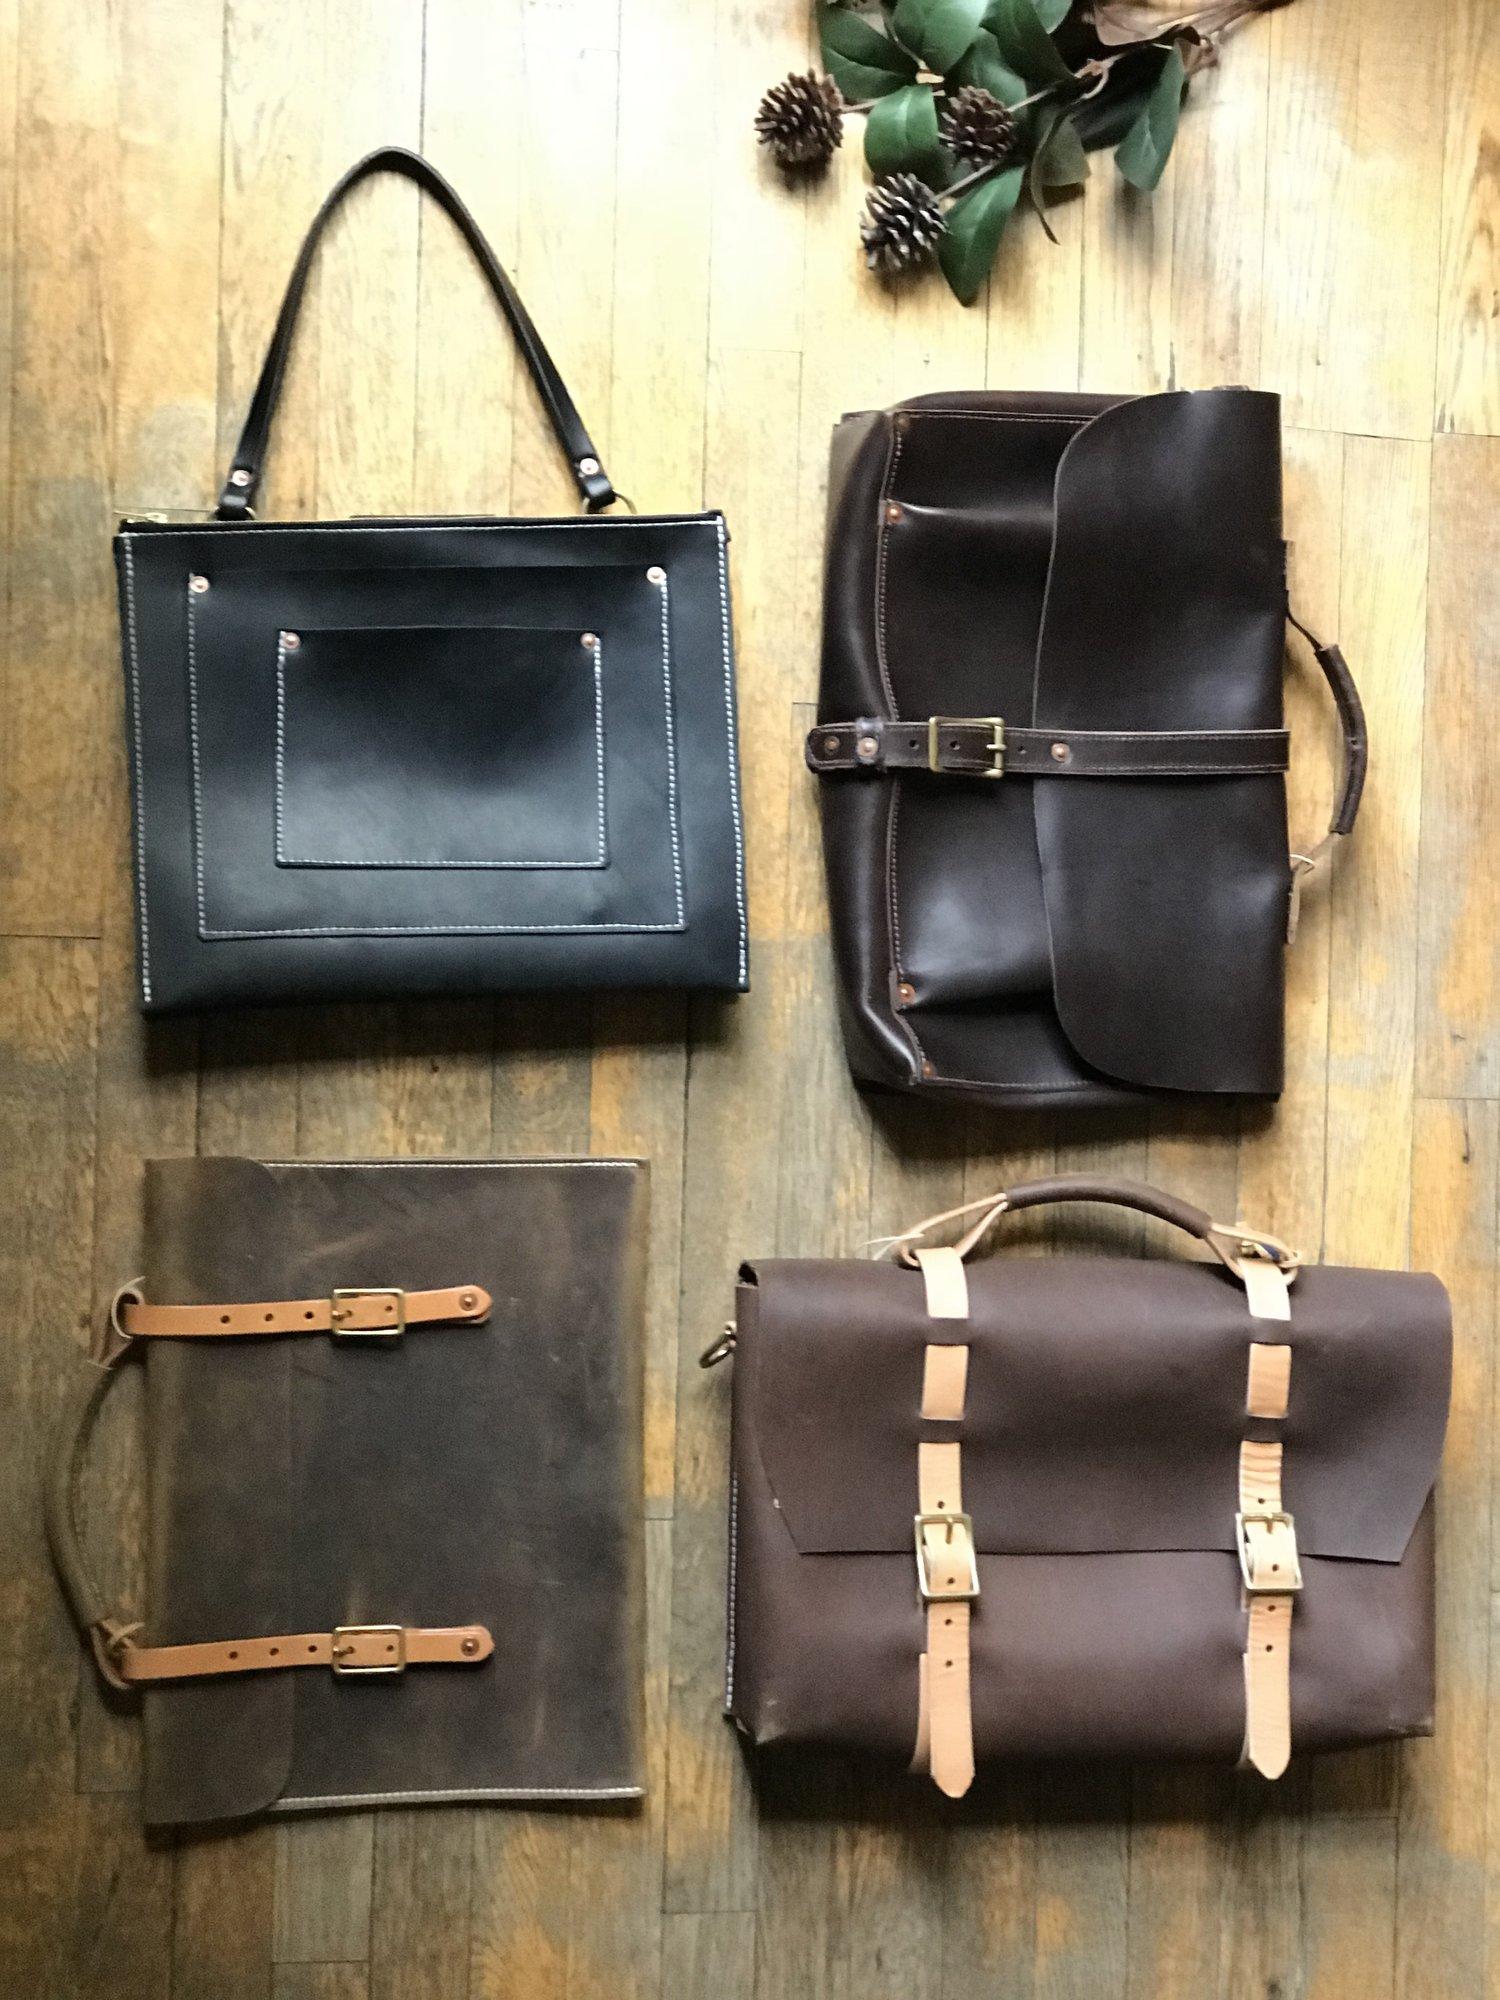 Briefcases.jpg